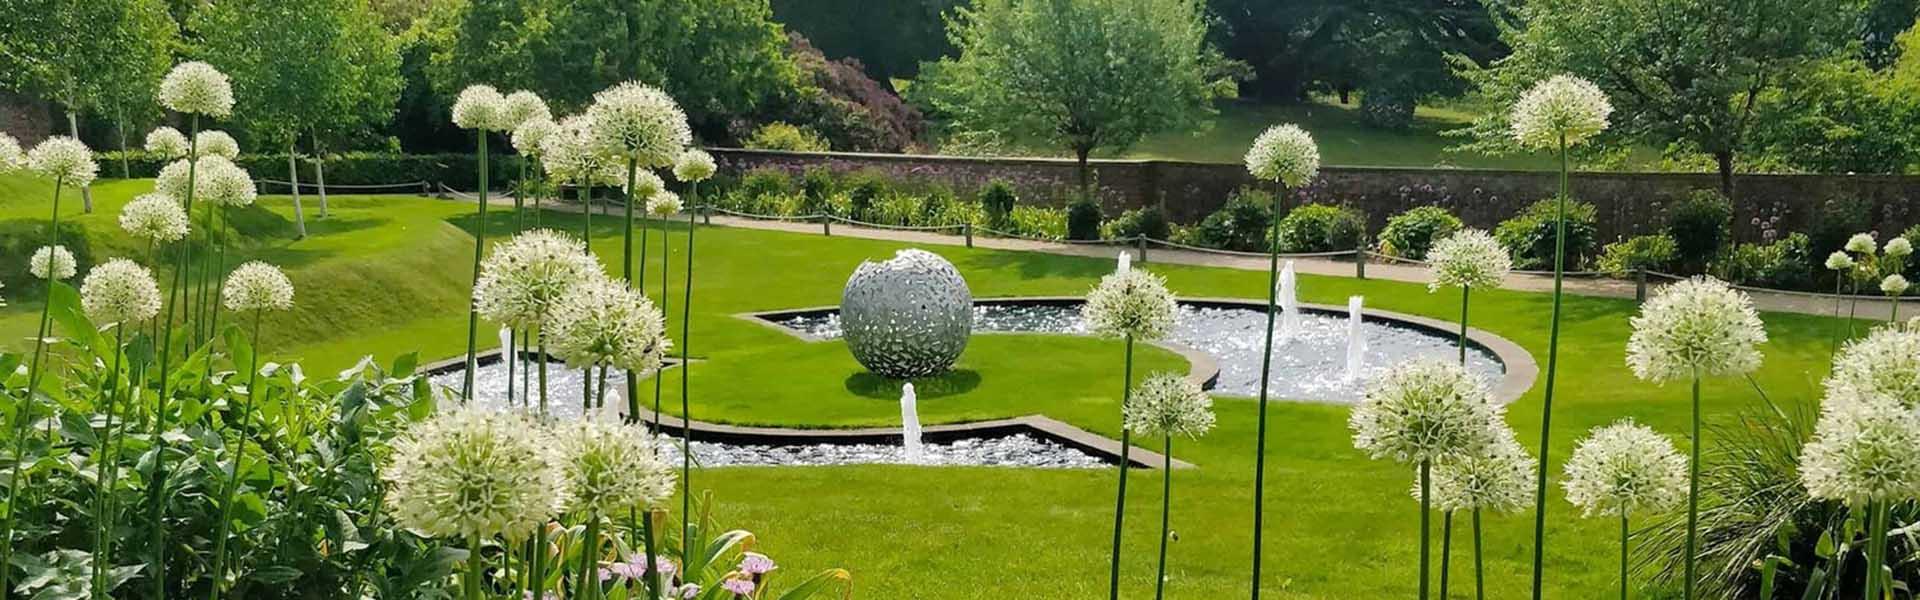 Walled garden at riverhill himalayan gardens